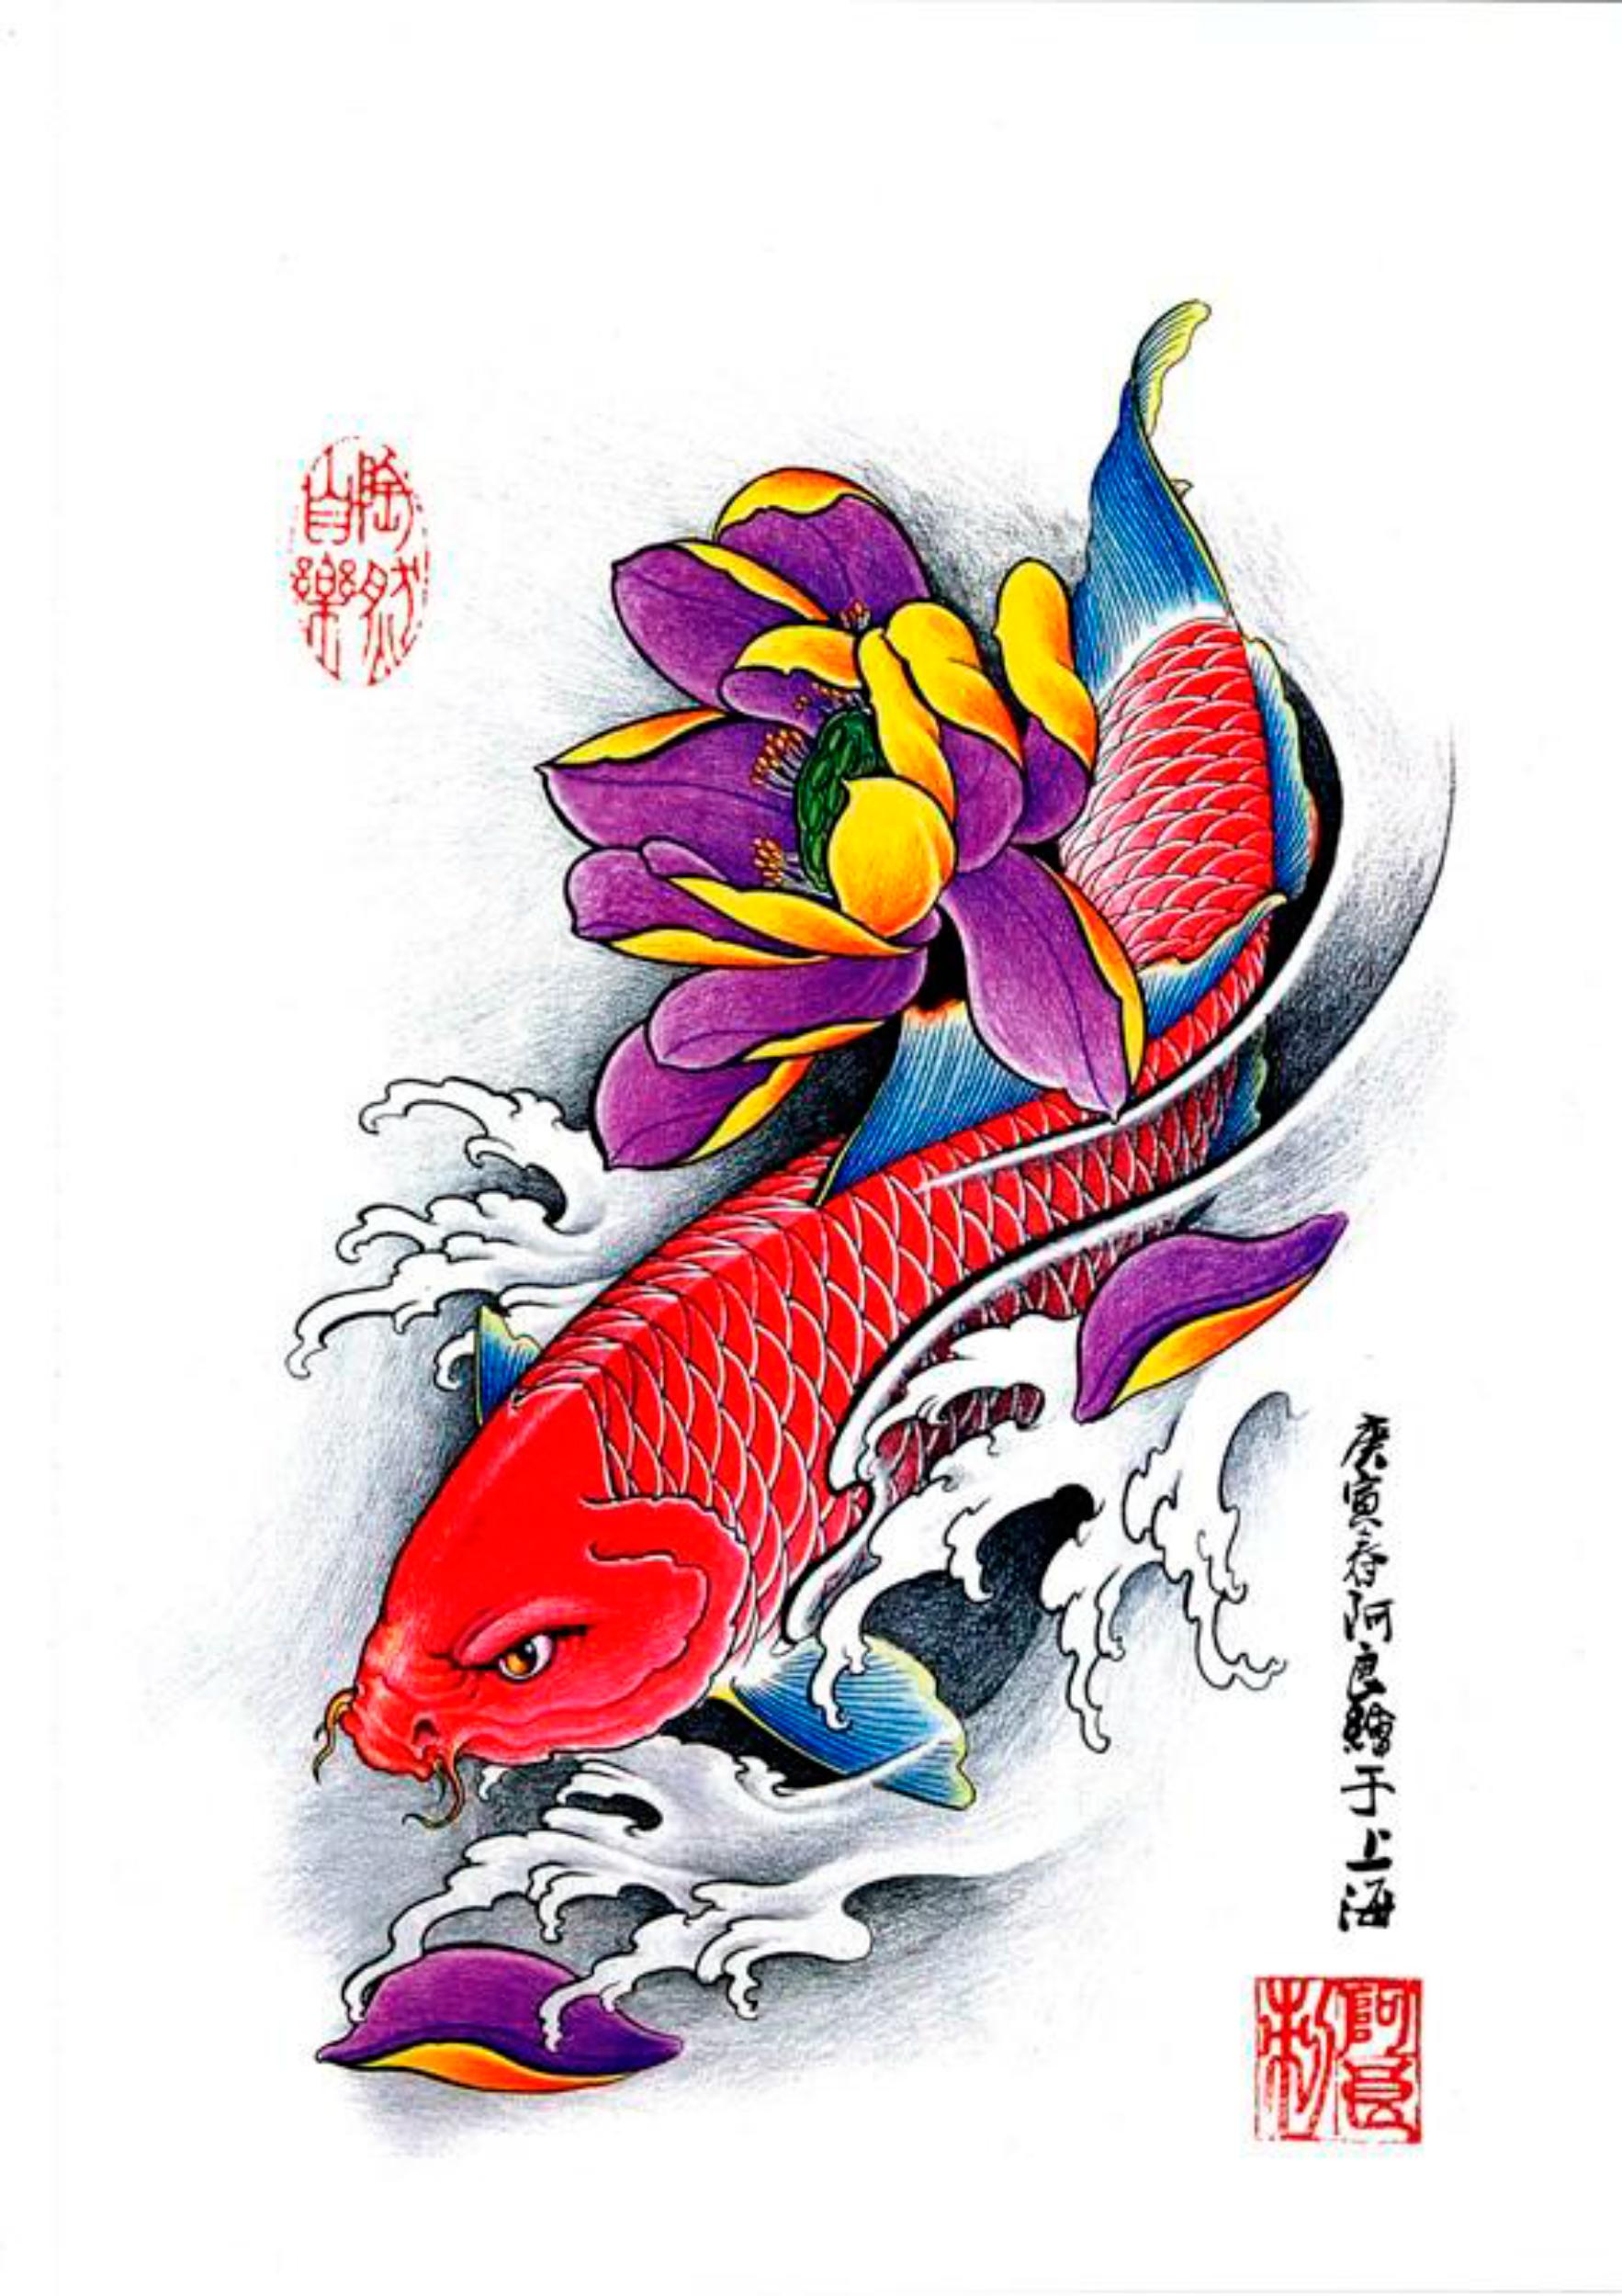 Pin by Lioubov on Fish art   Pinterest   Koi, Tattoo and Koi fish tattoo